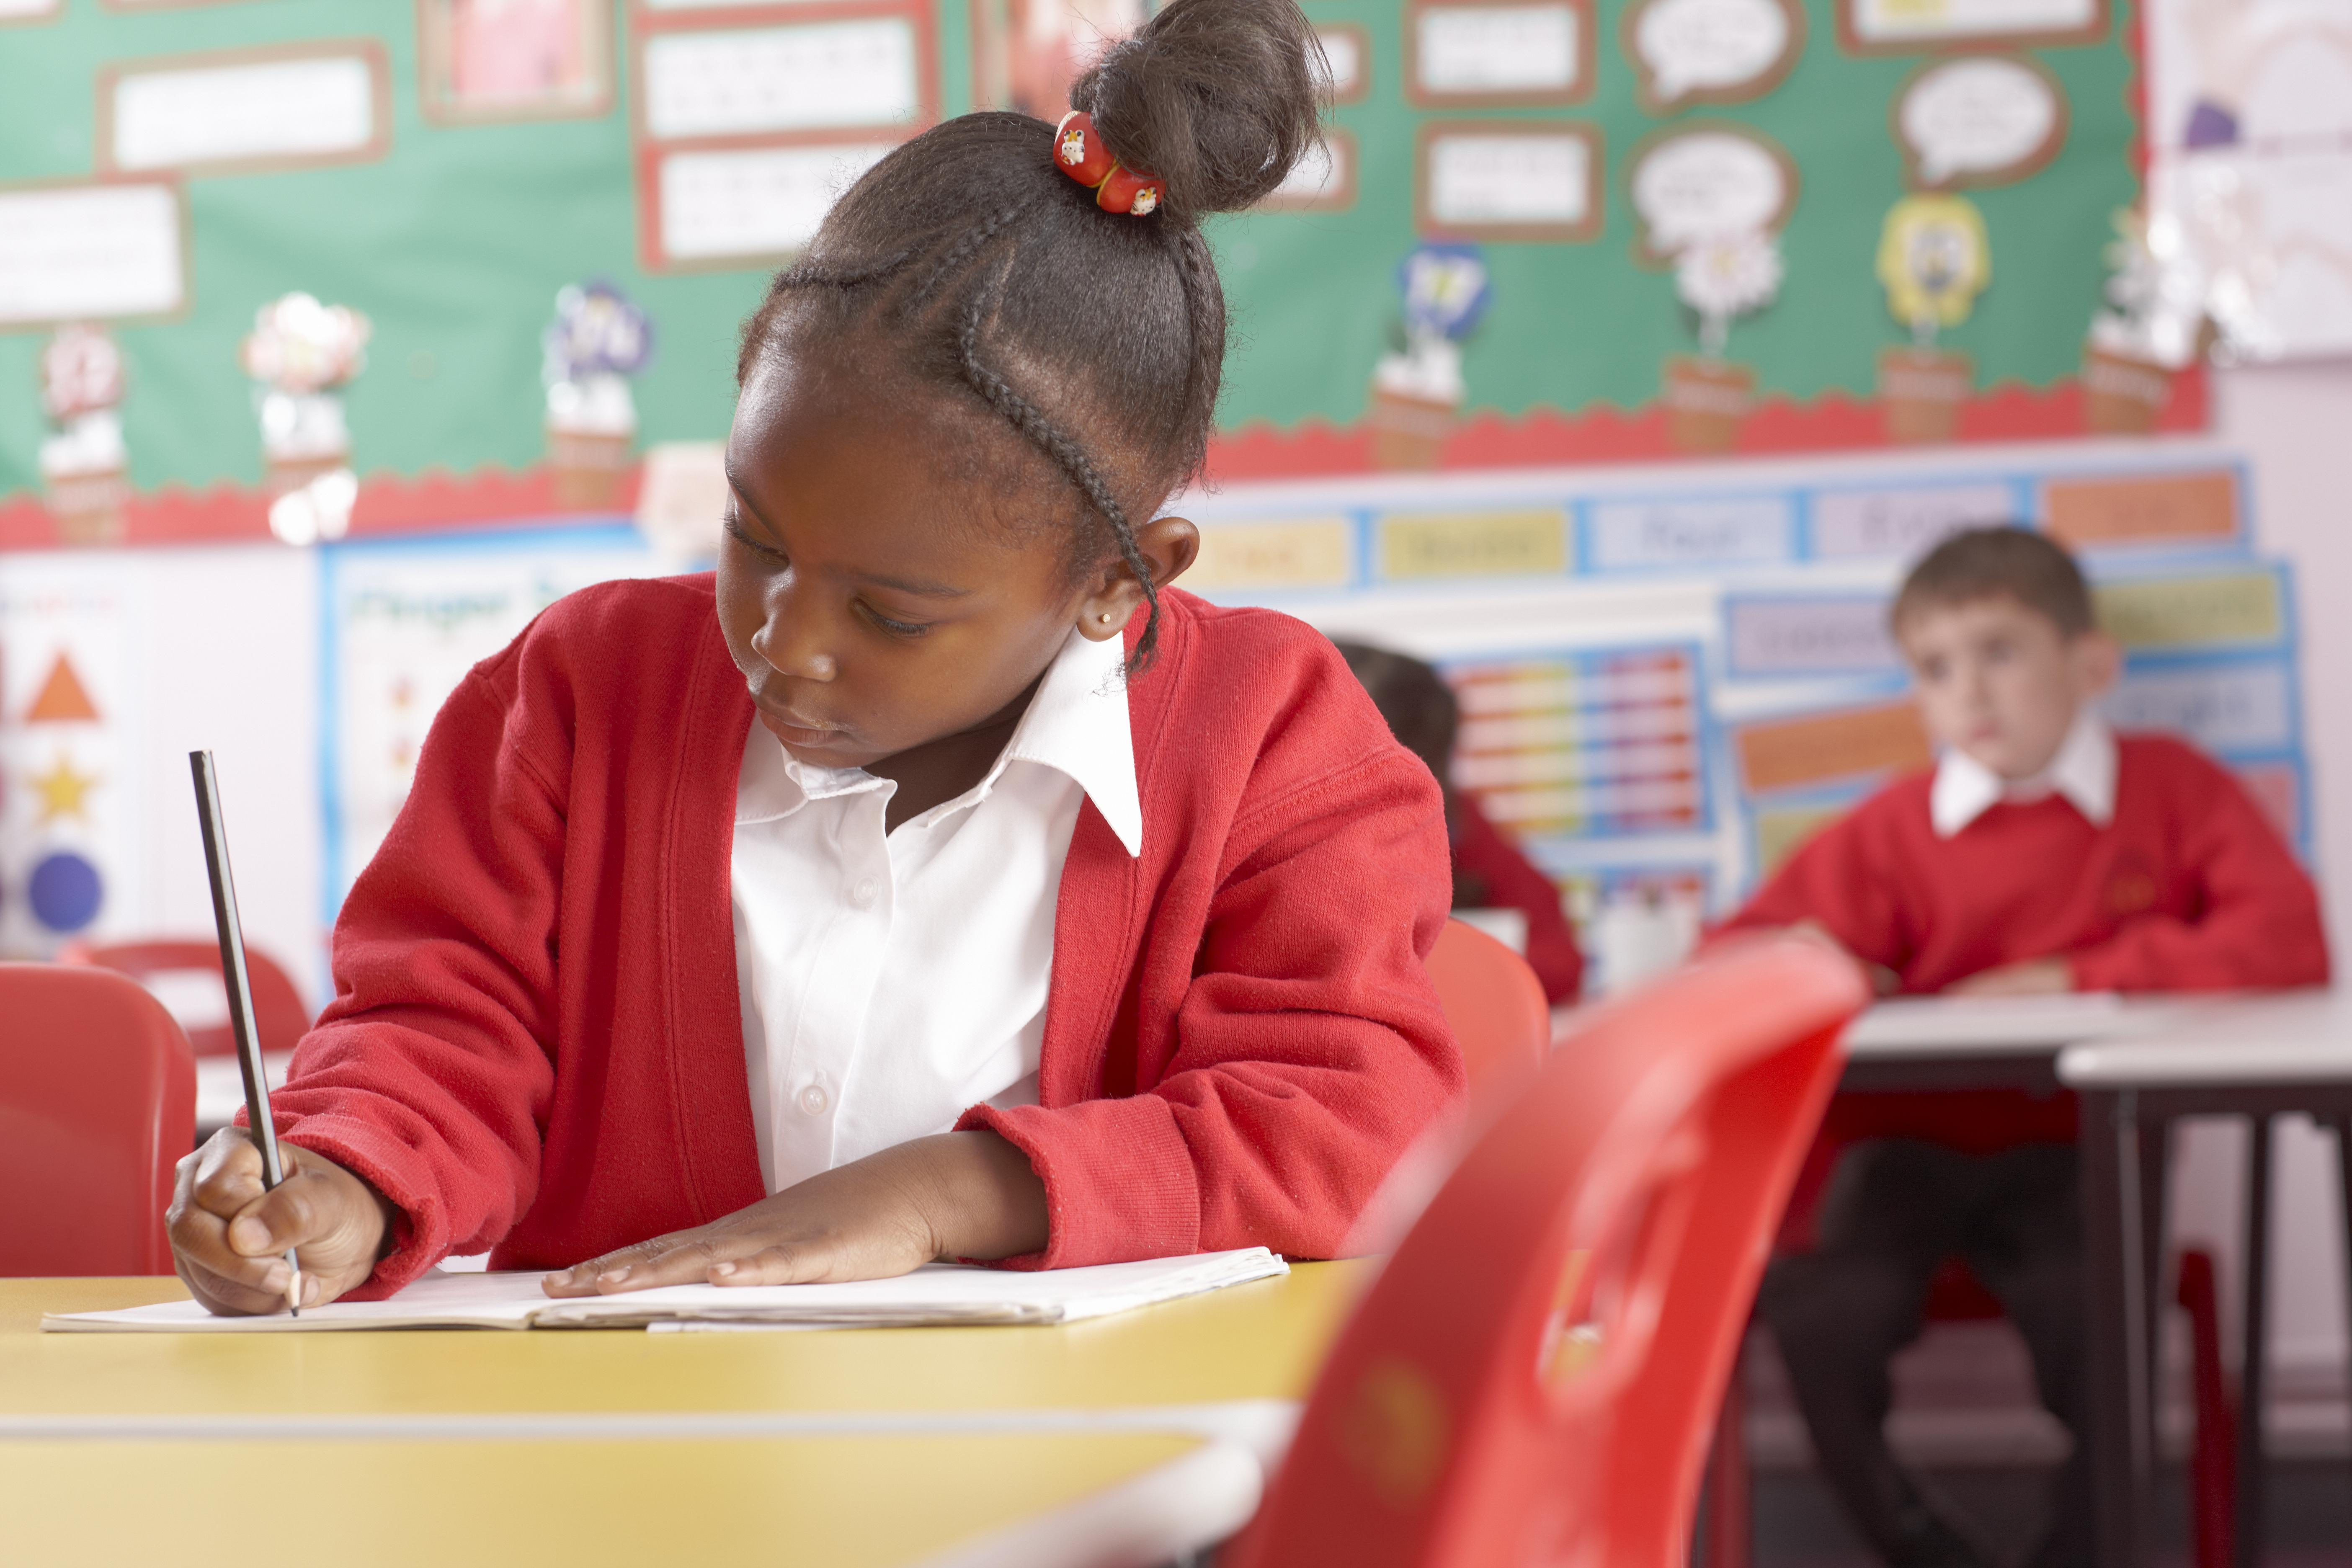 School child writing in book